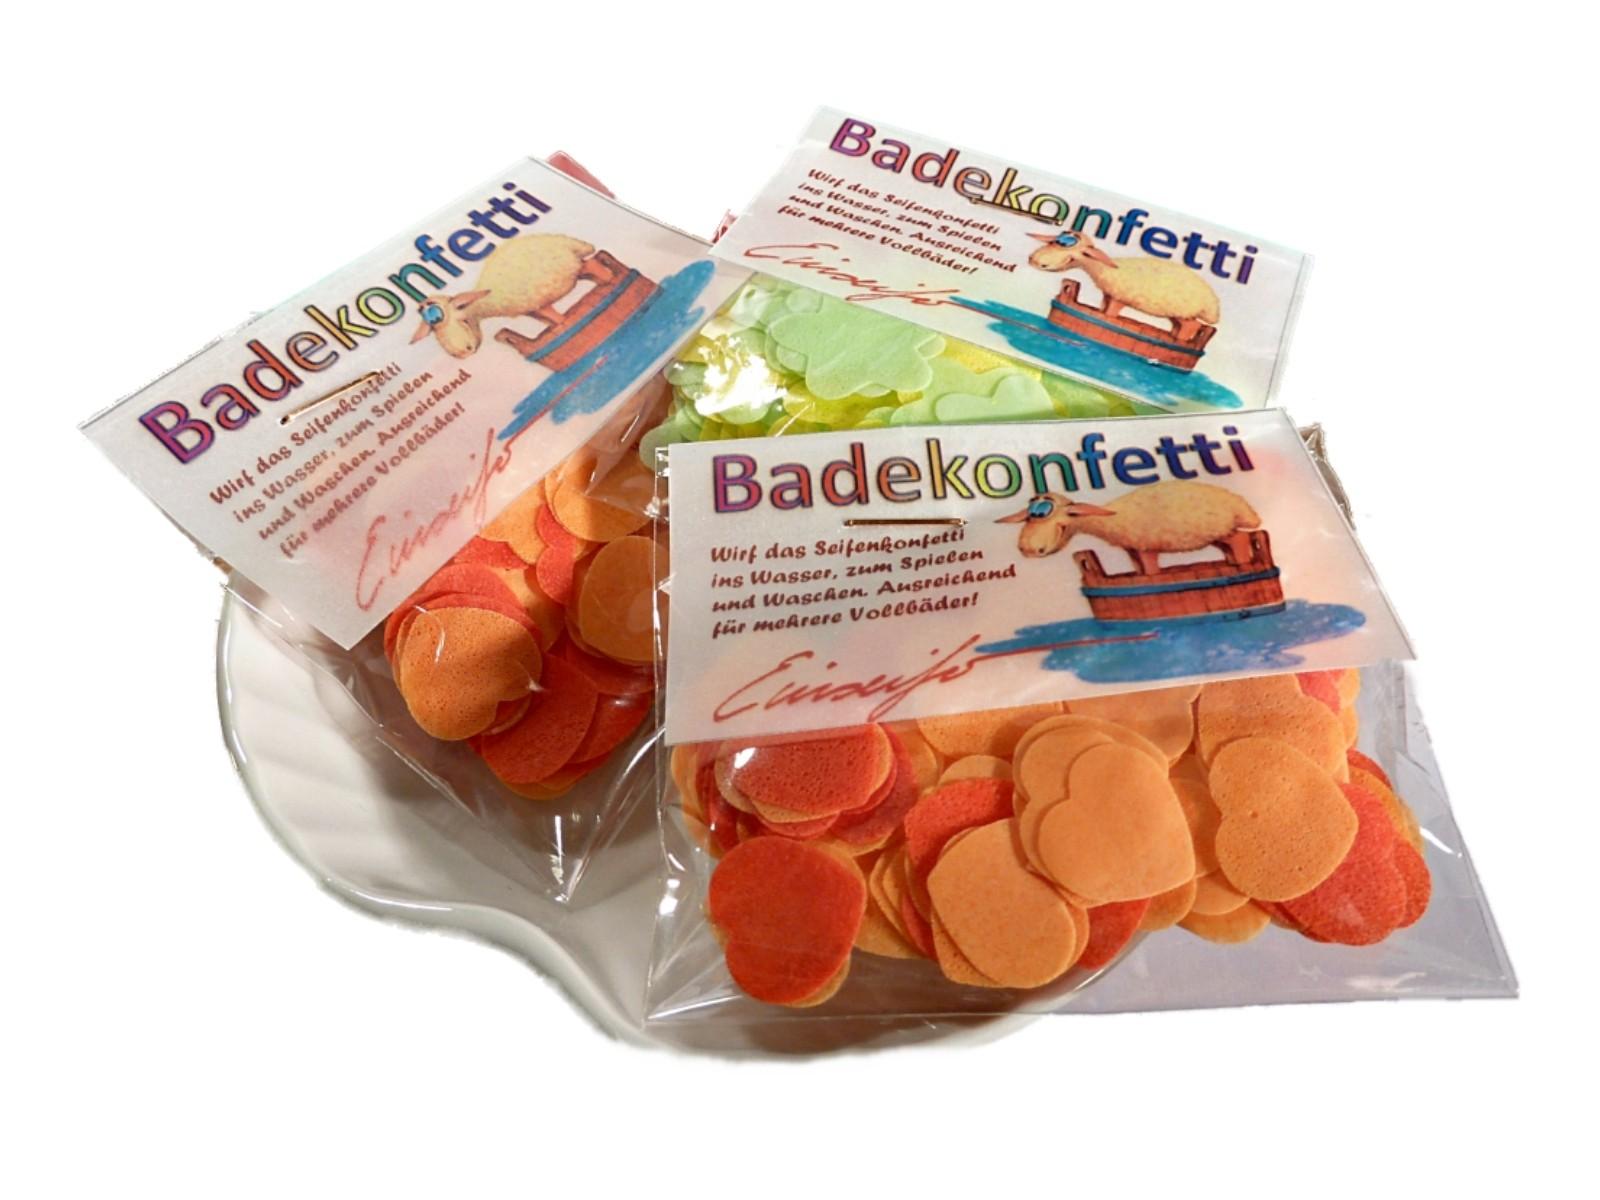 einseifer-kinder-bade-konfetti-badekonfetti-bunt-badespass